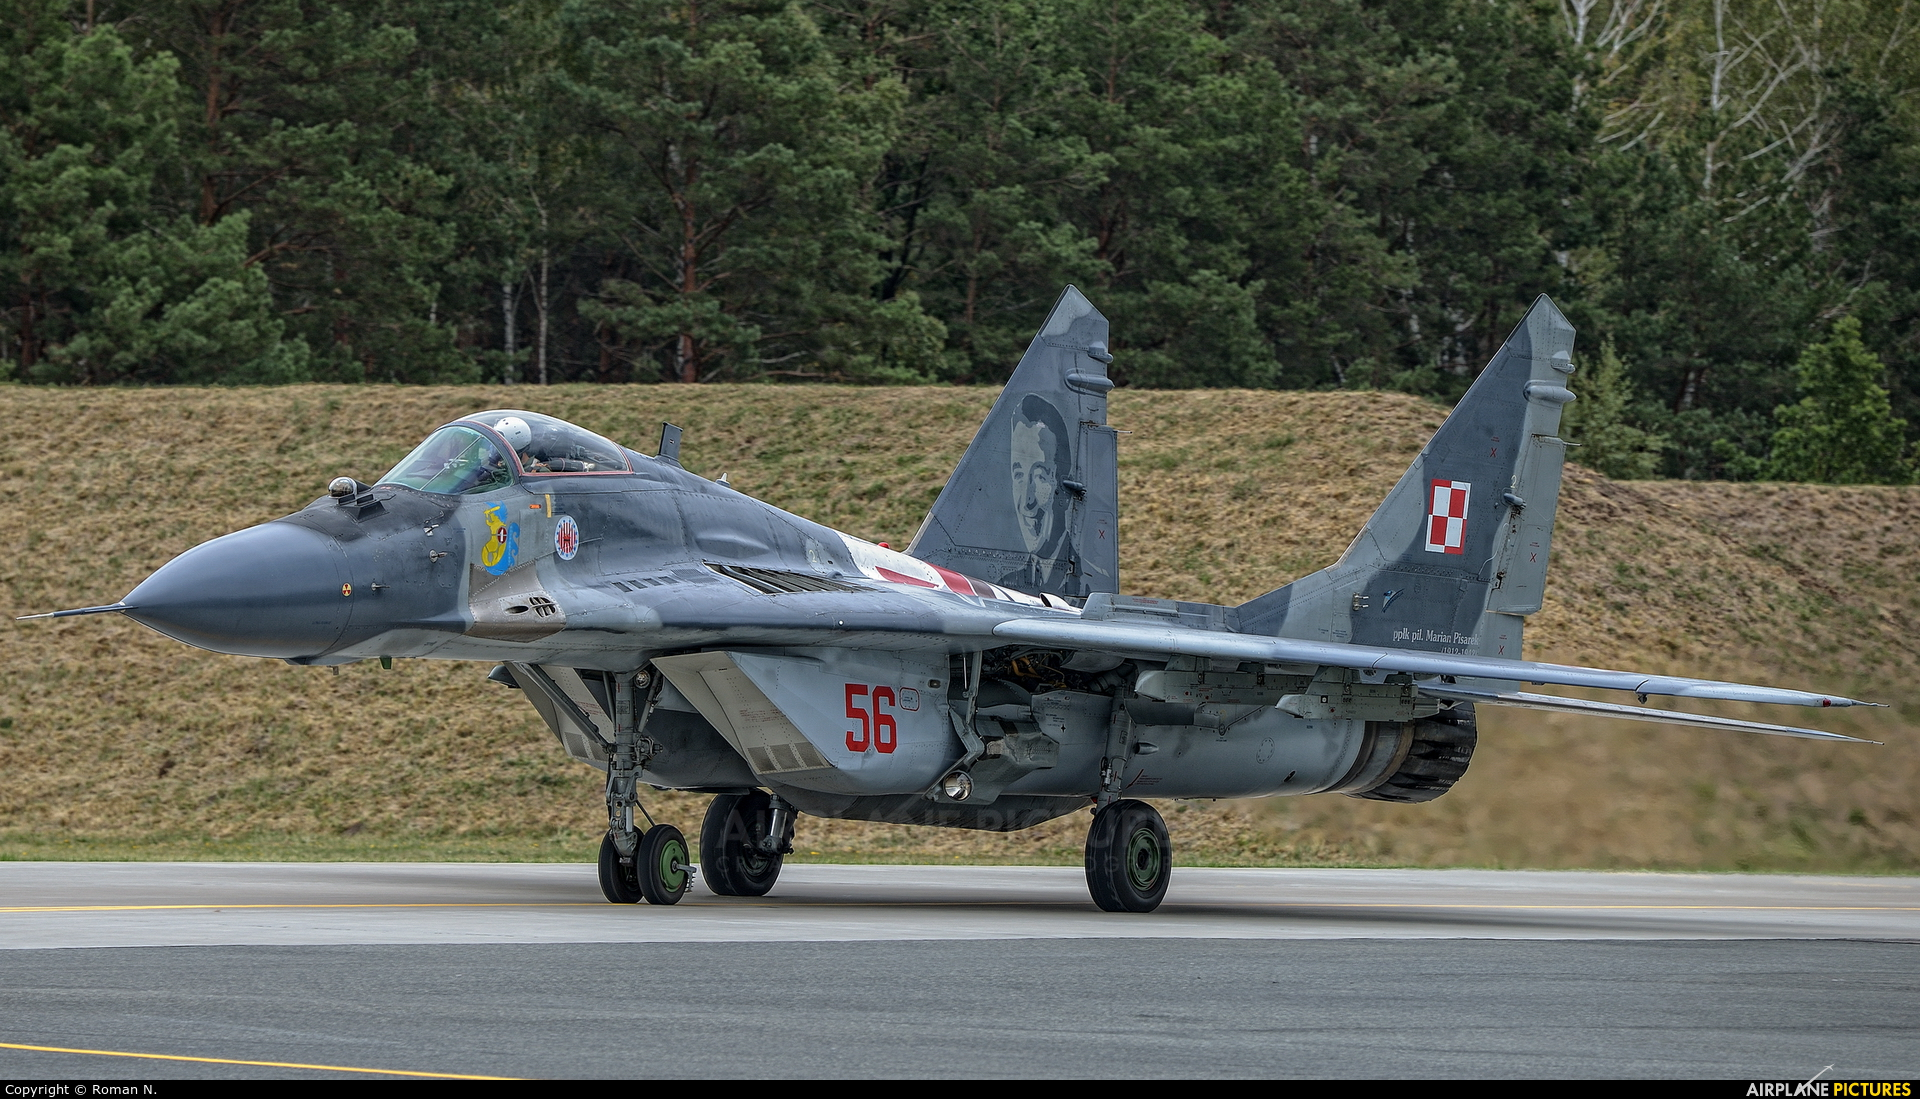 Poland - Air Force 56 aircraft at Łask AB